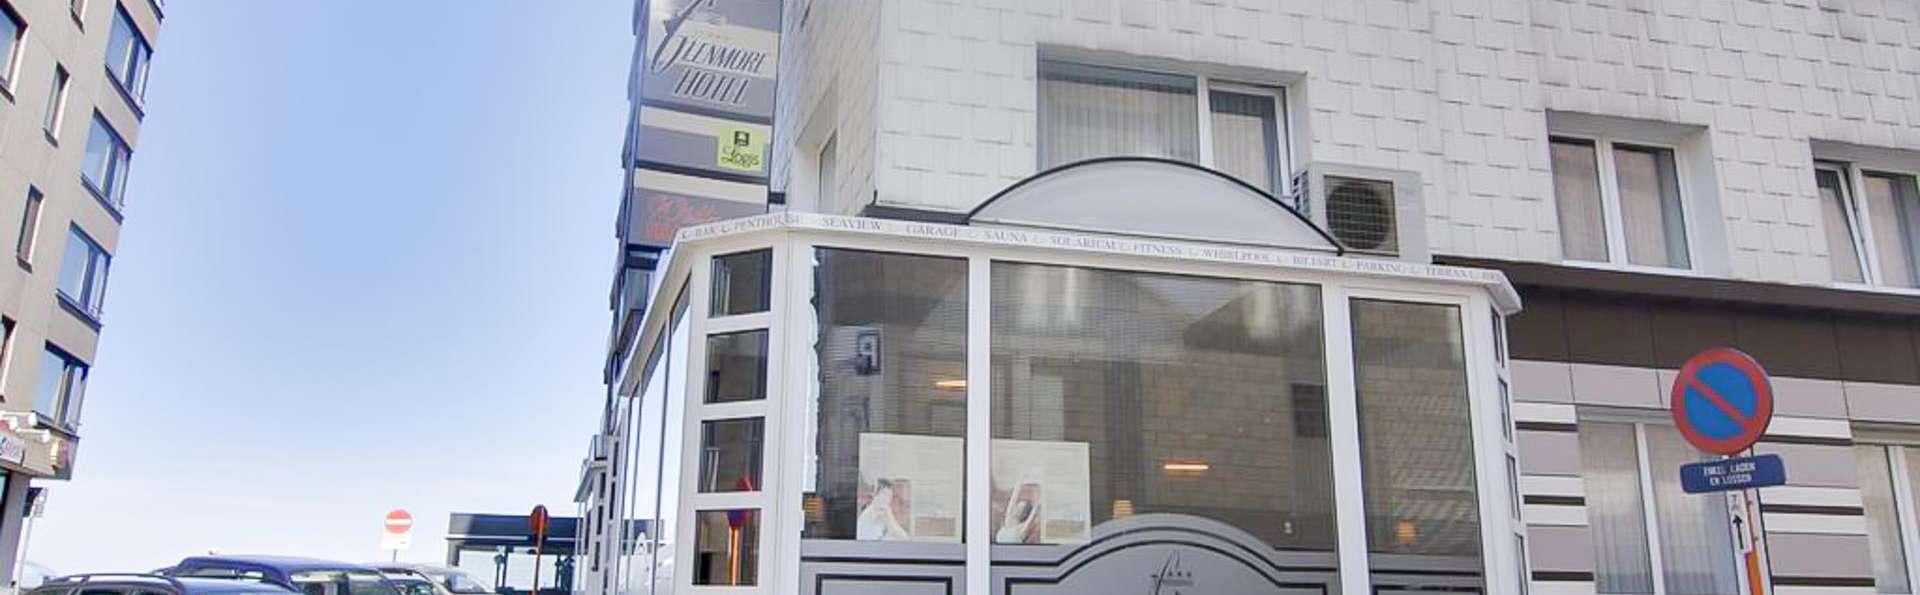 Hotel Glenmore  - EDIT_FRONT_01.jpg